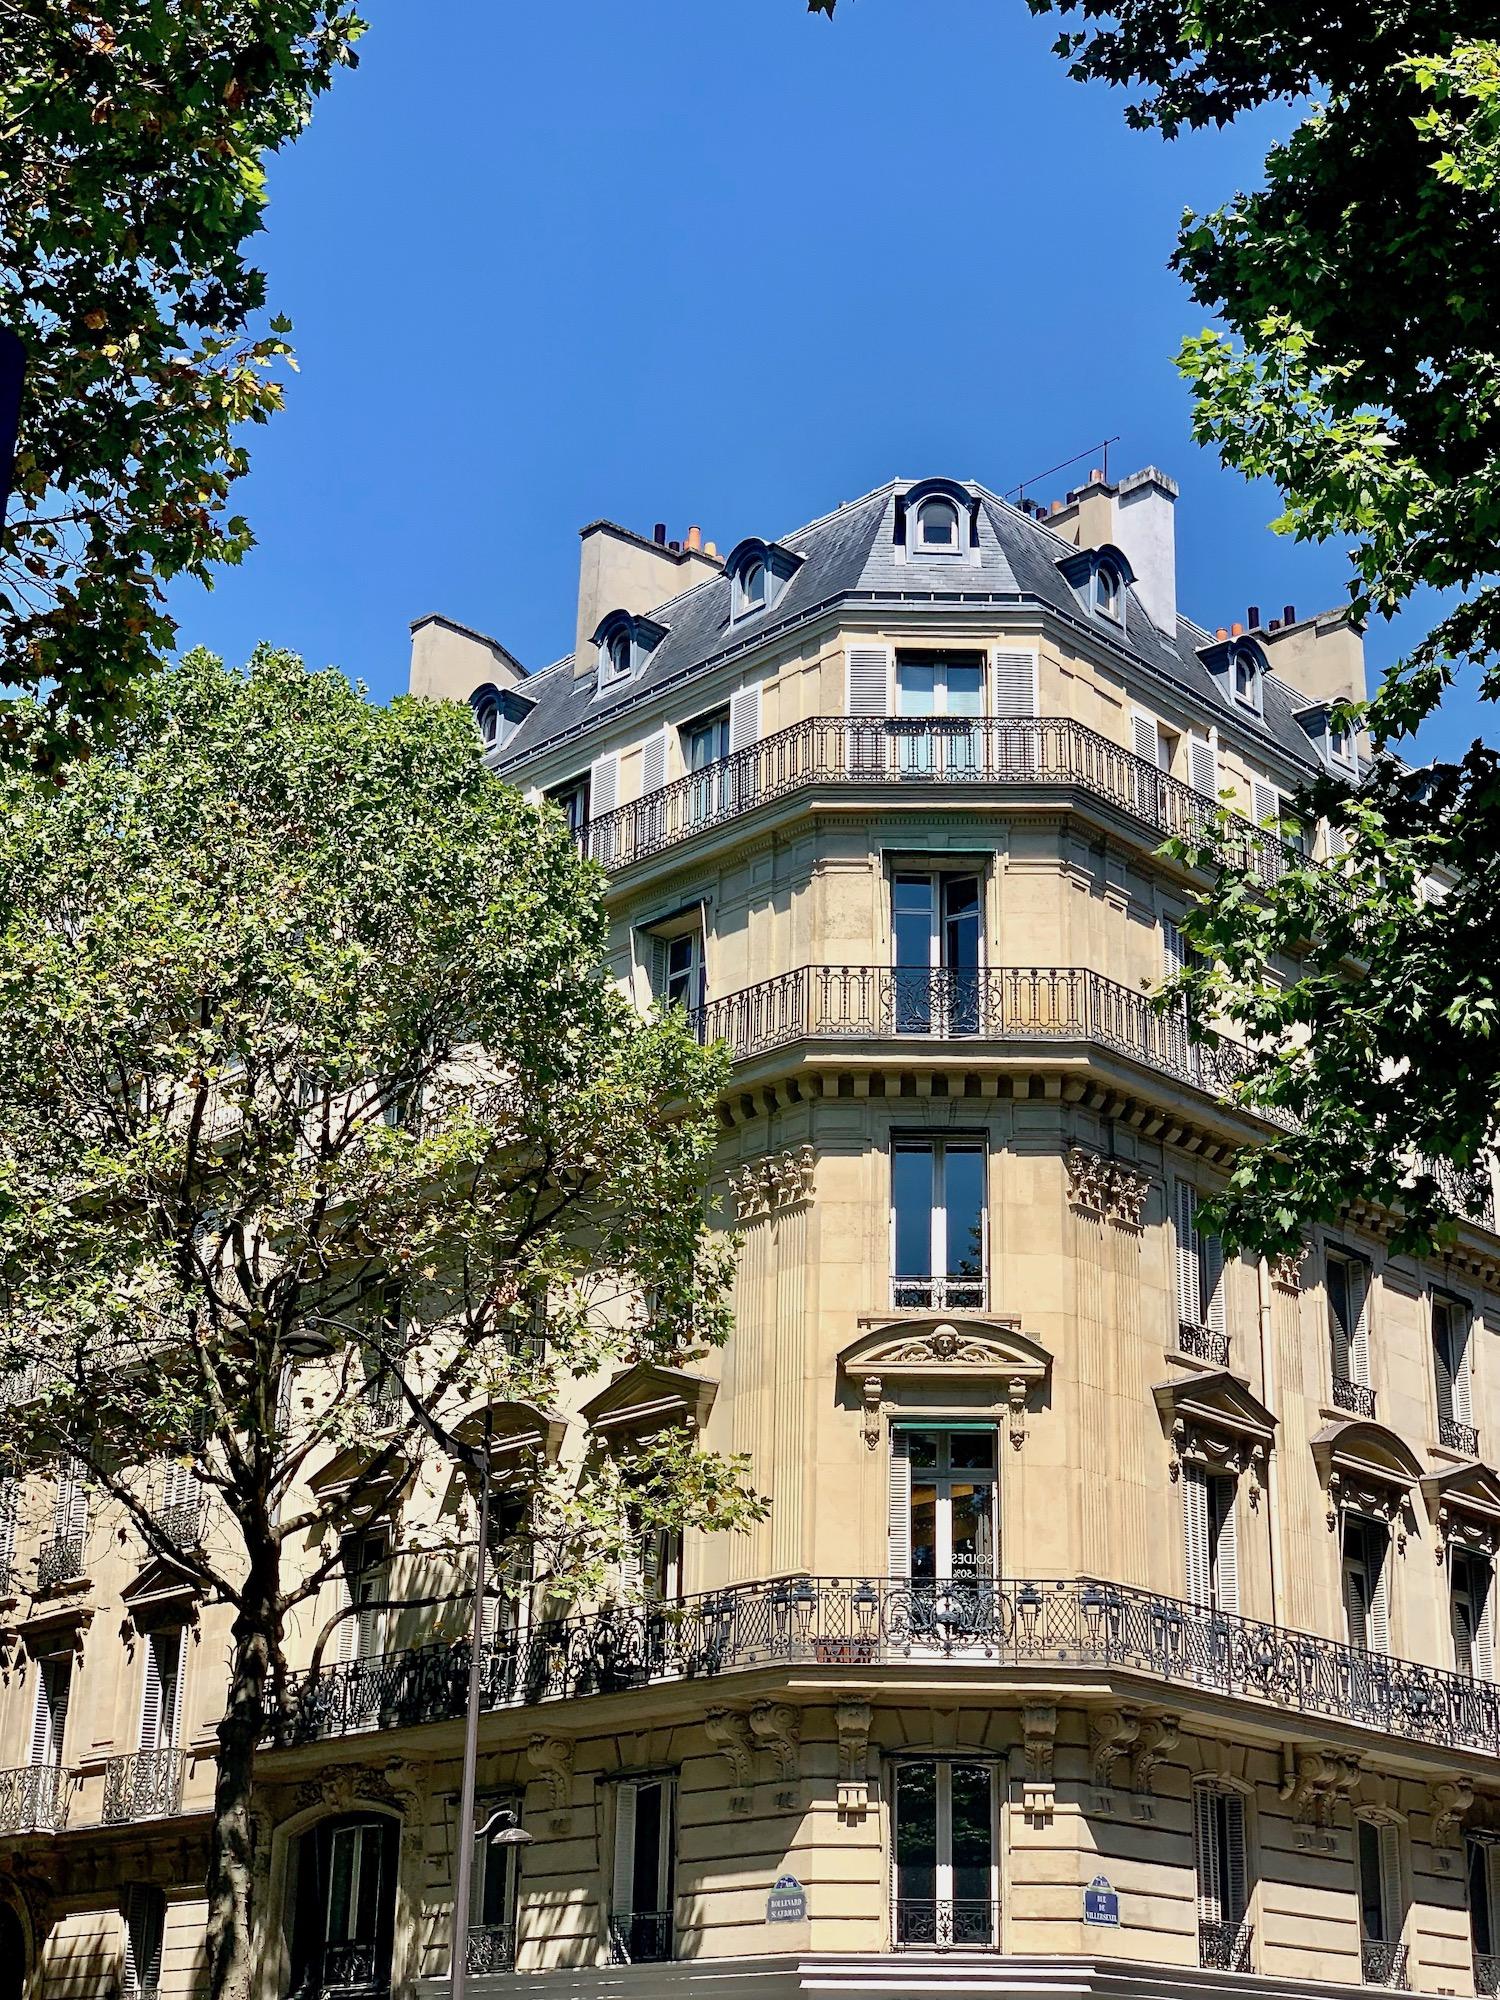 Boulevard Saint Germain Building